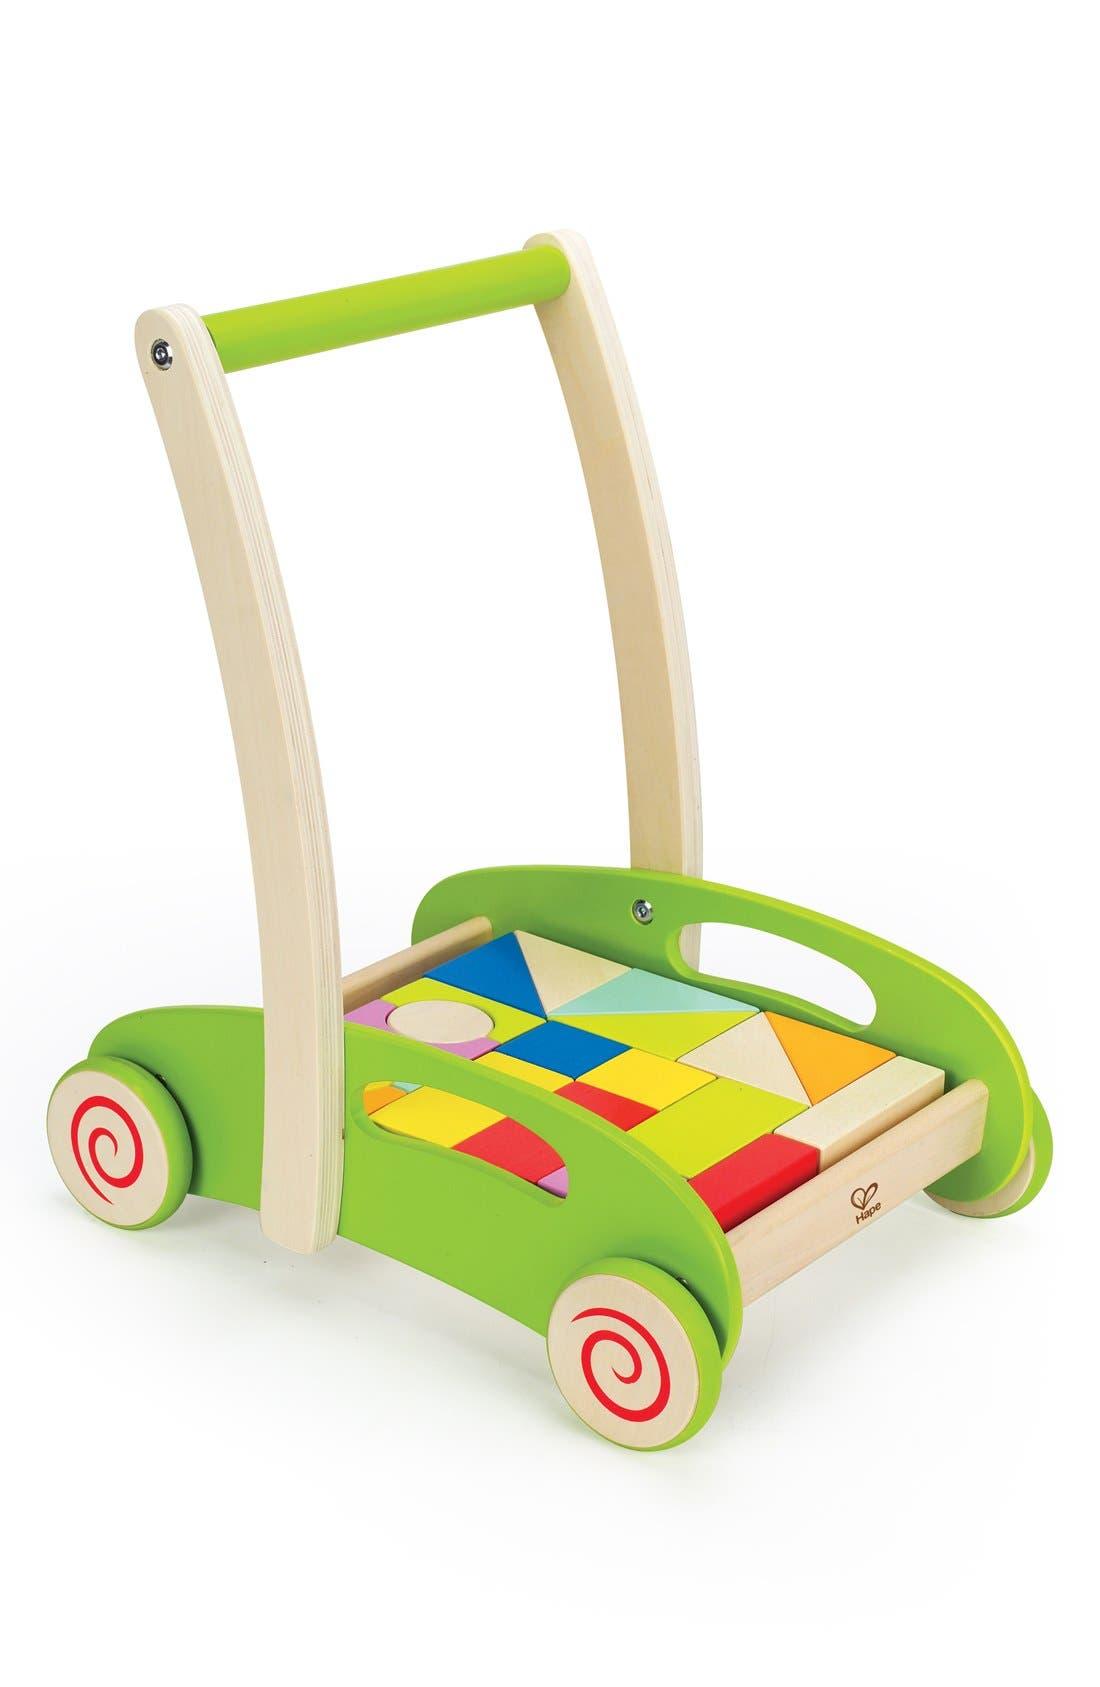 'Block & Roll' Push Toy,                             Main thumbnail 1, color,                             Green